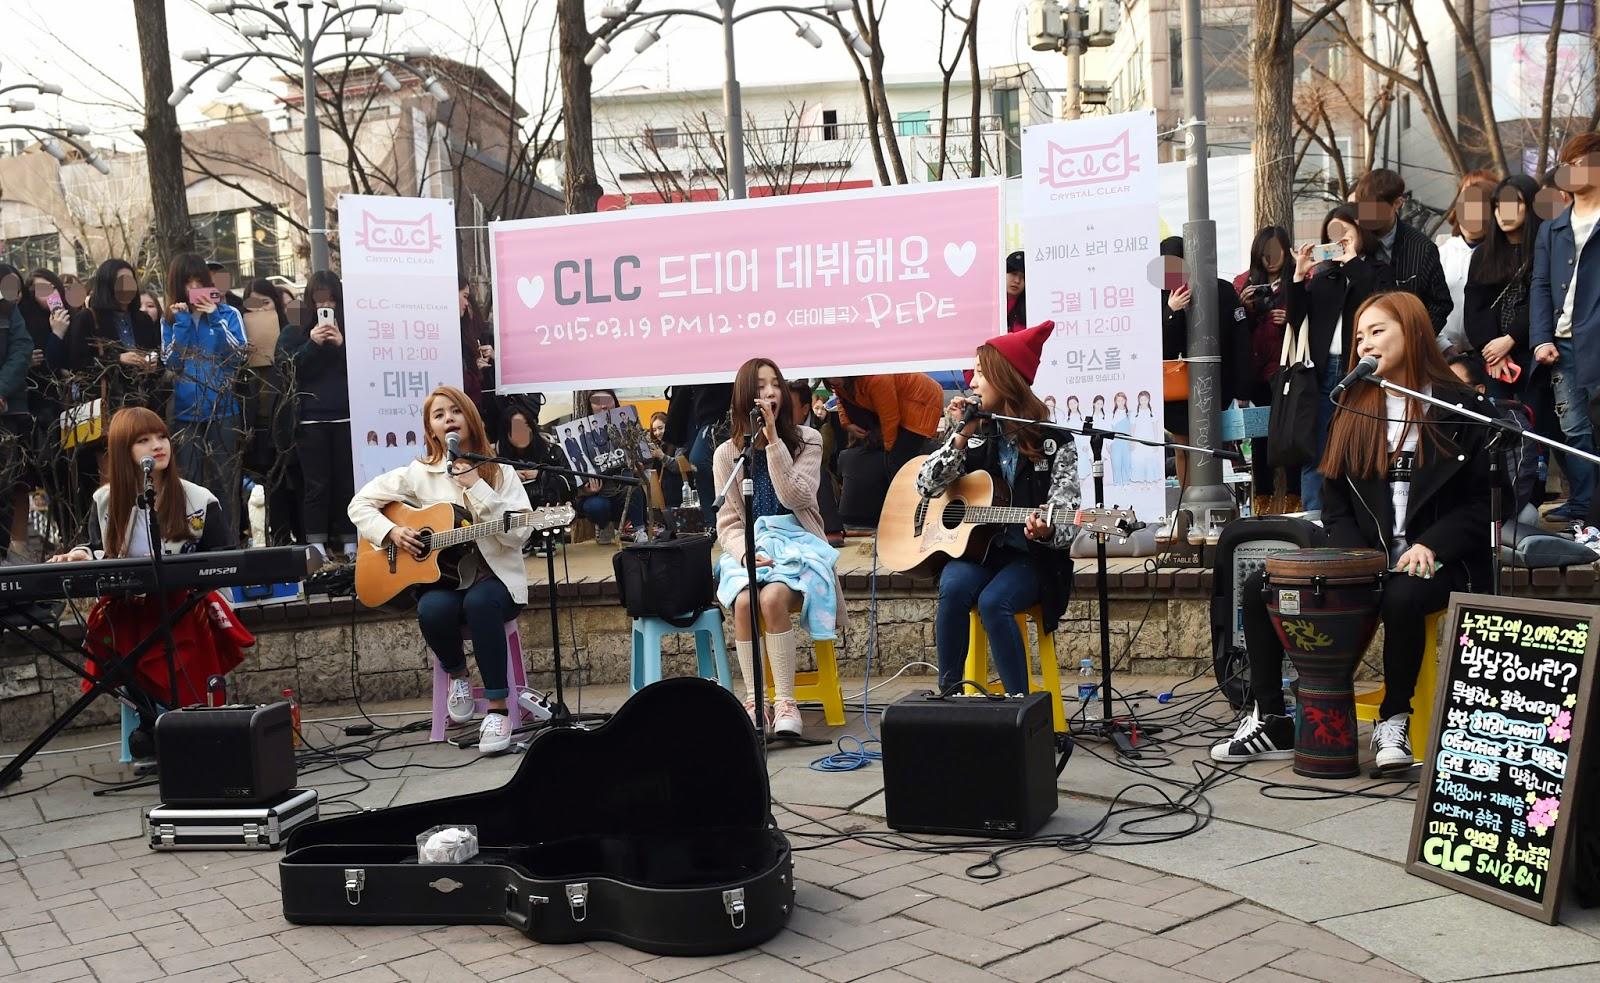 The reason why kpop idols show performance on the streets - Kpop